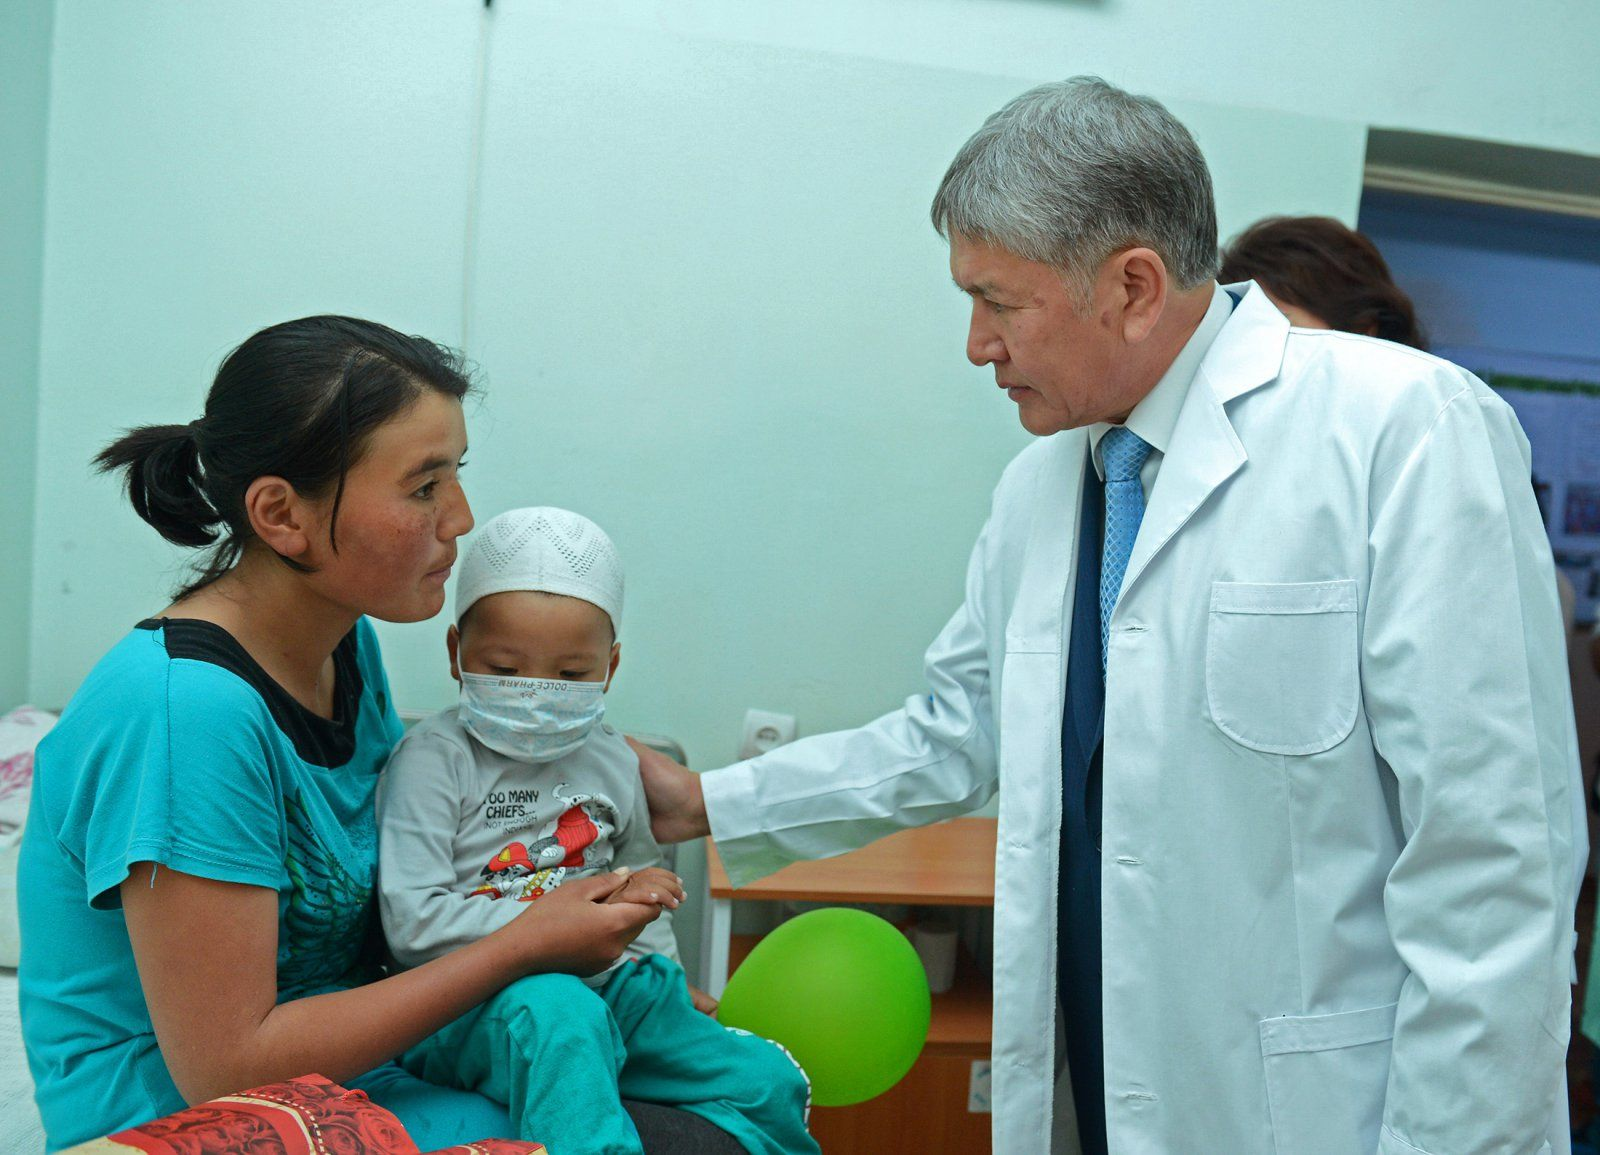 Atambajew beim Besuch des nationalen onkologischen Zentrums